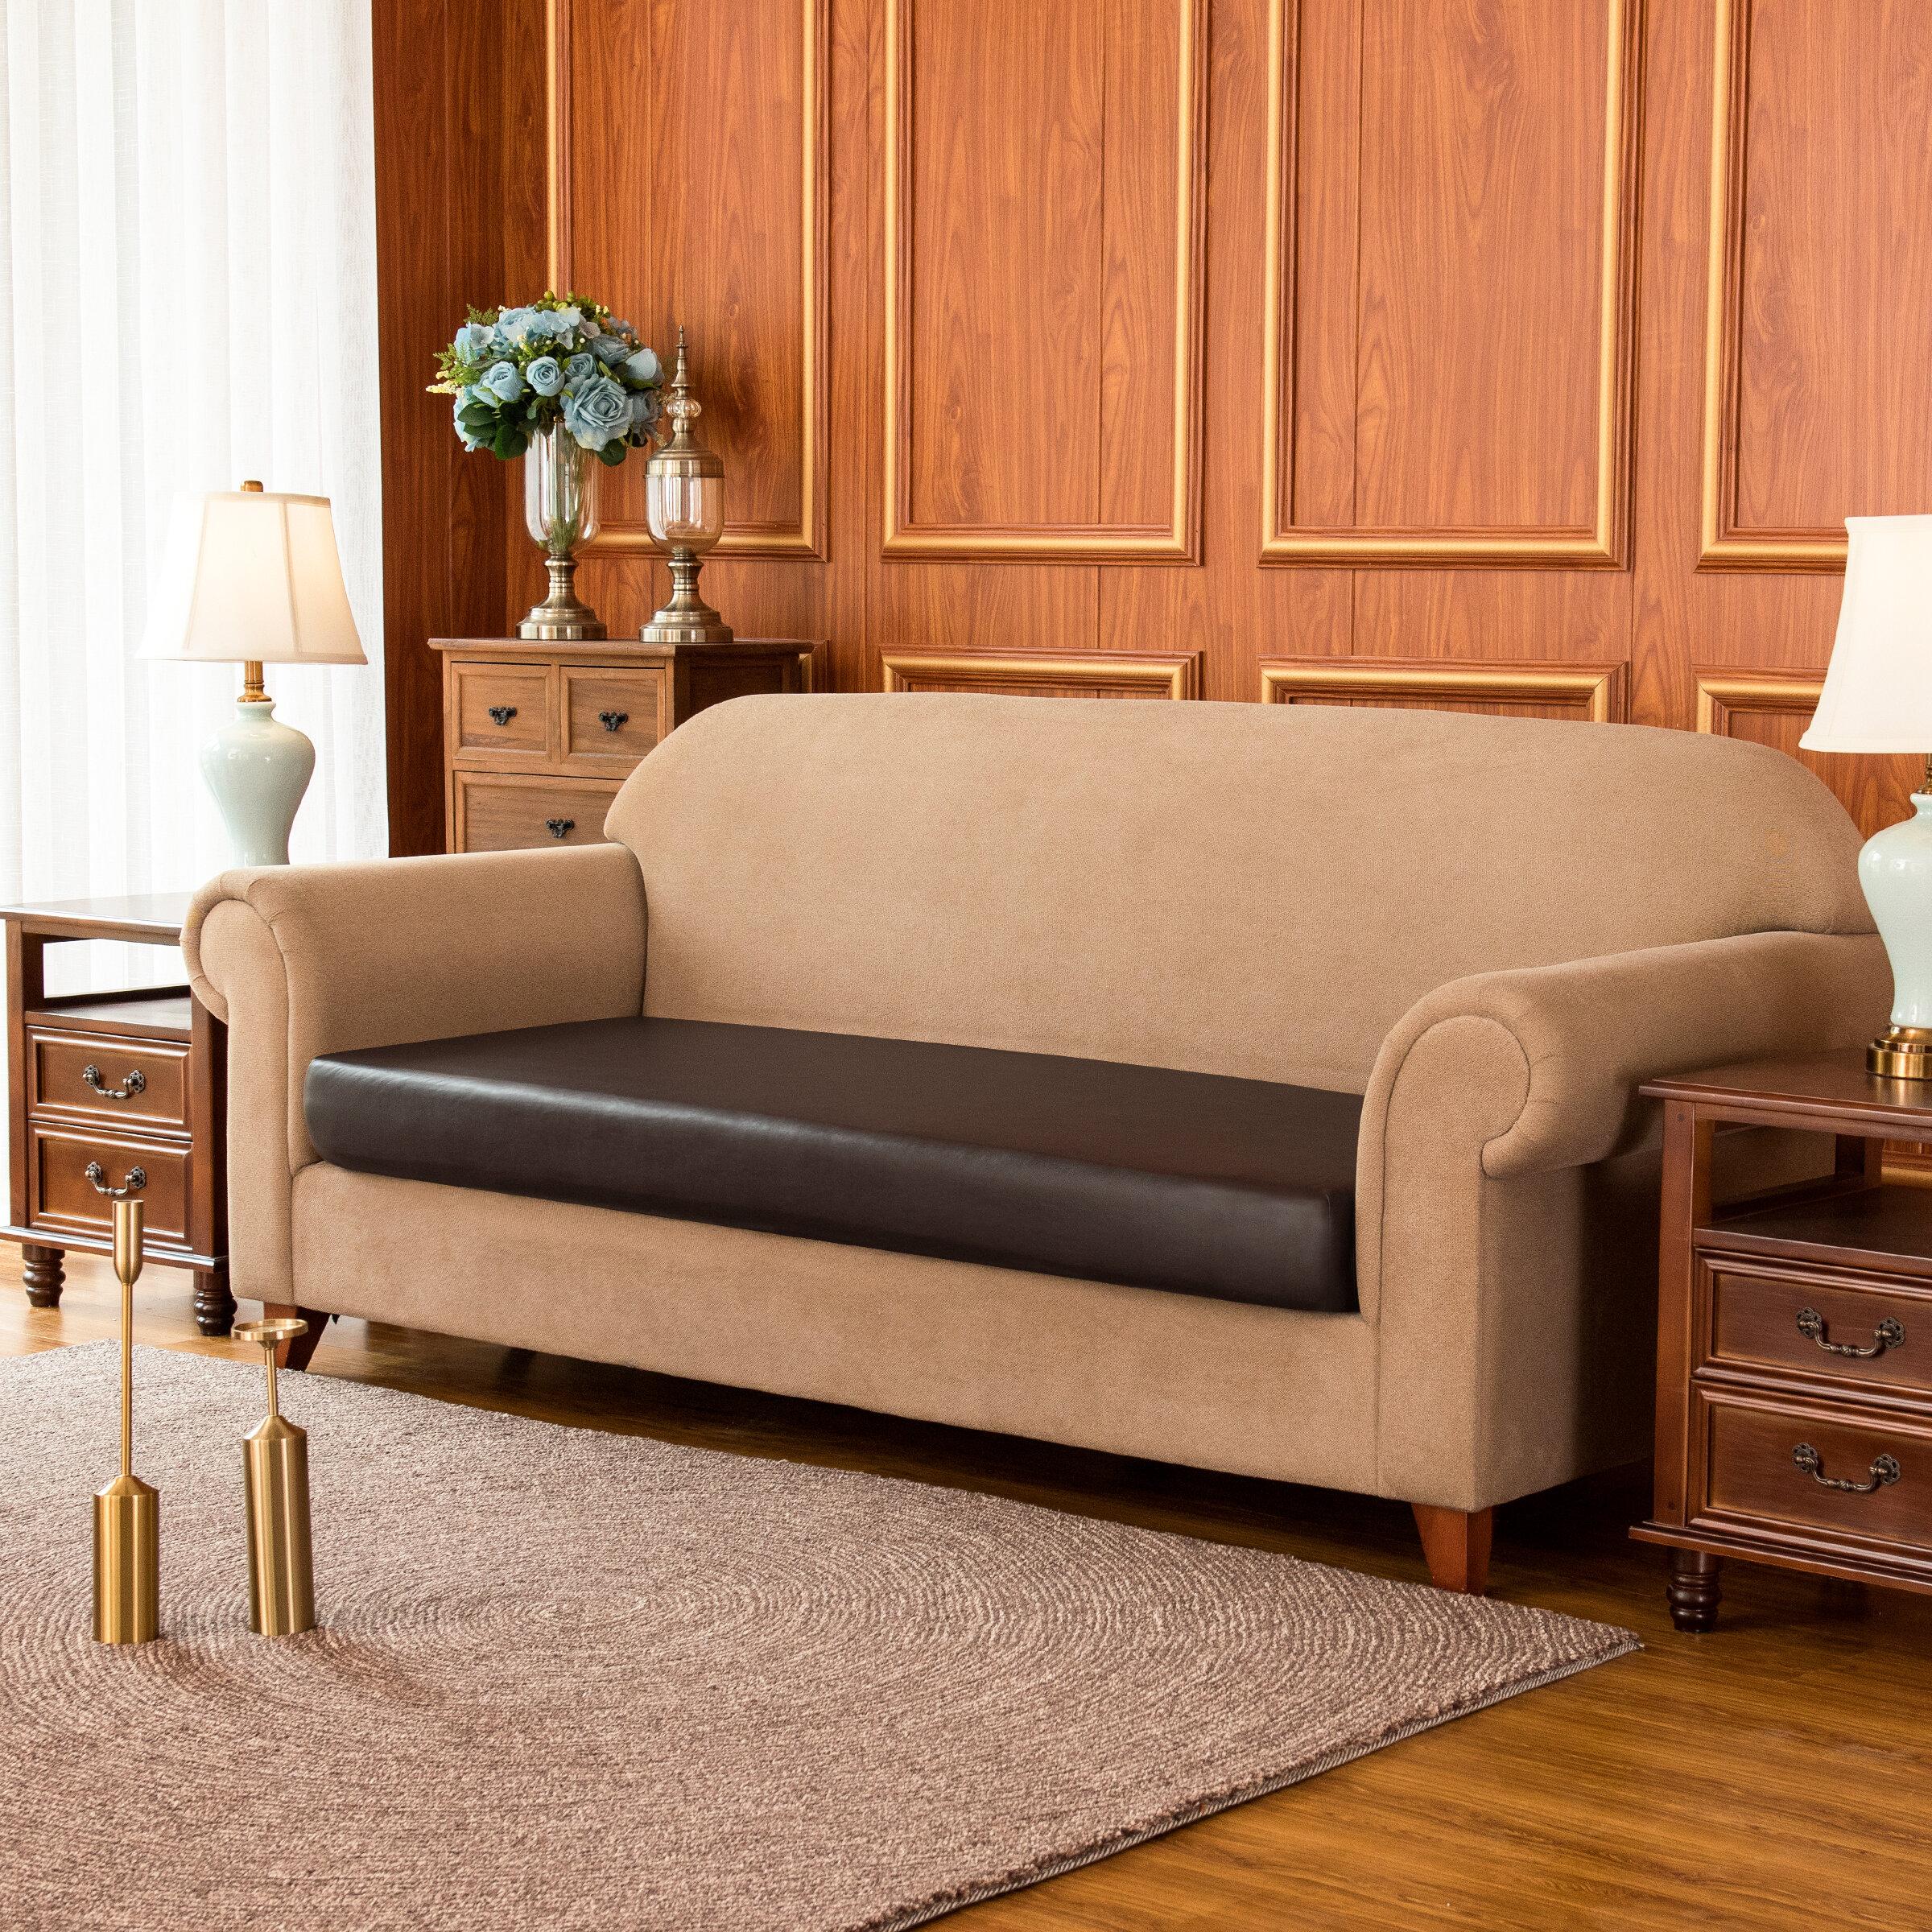 Ebern Designs Pu Leather Waterproof Box Cushion Sofa Slipcover Reviews Wayfair